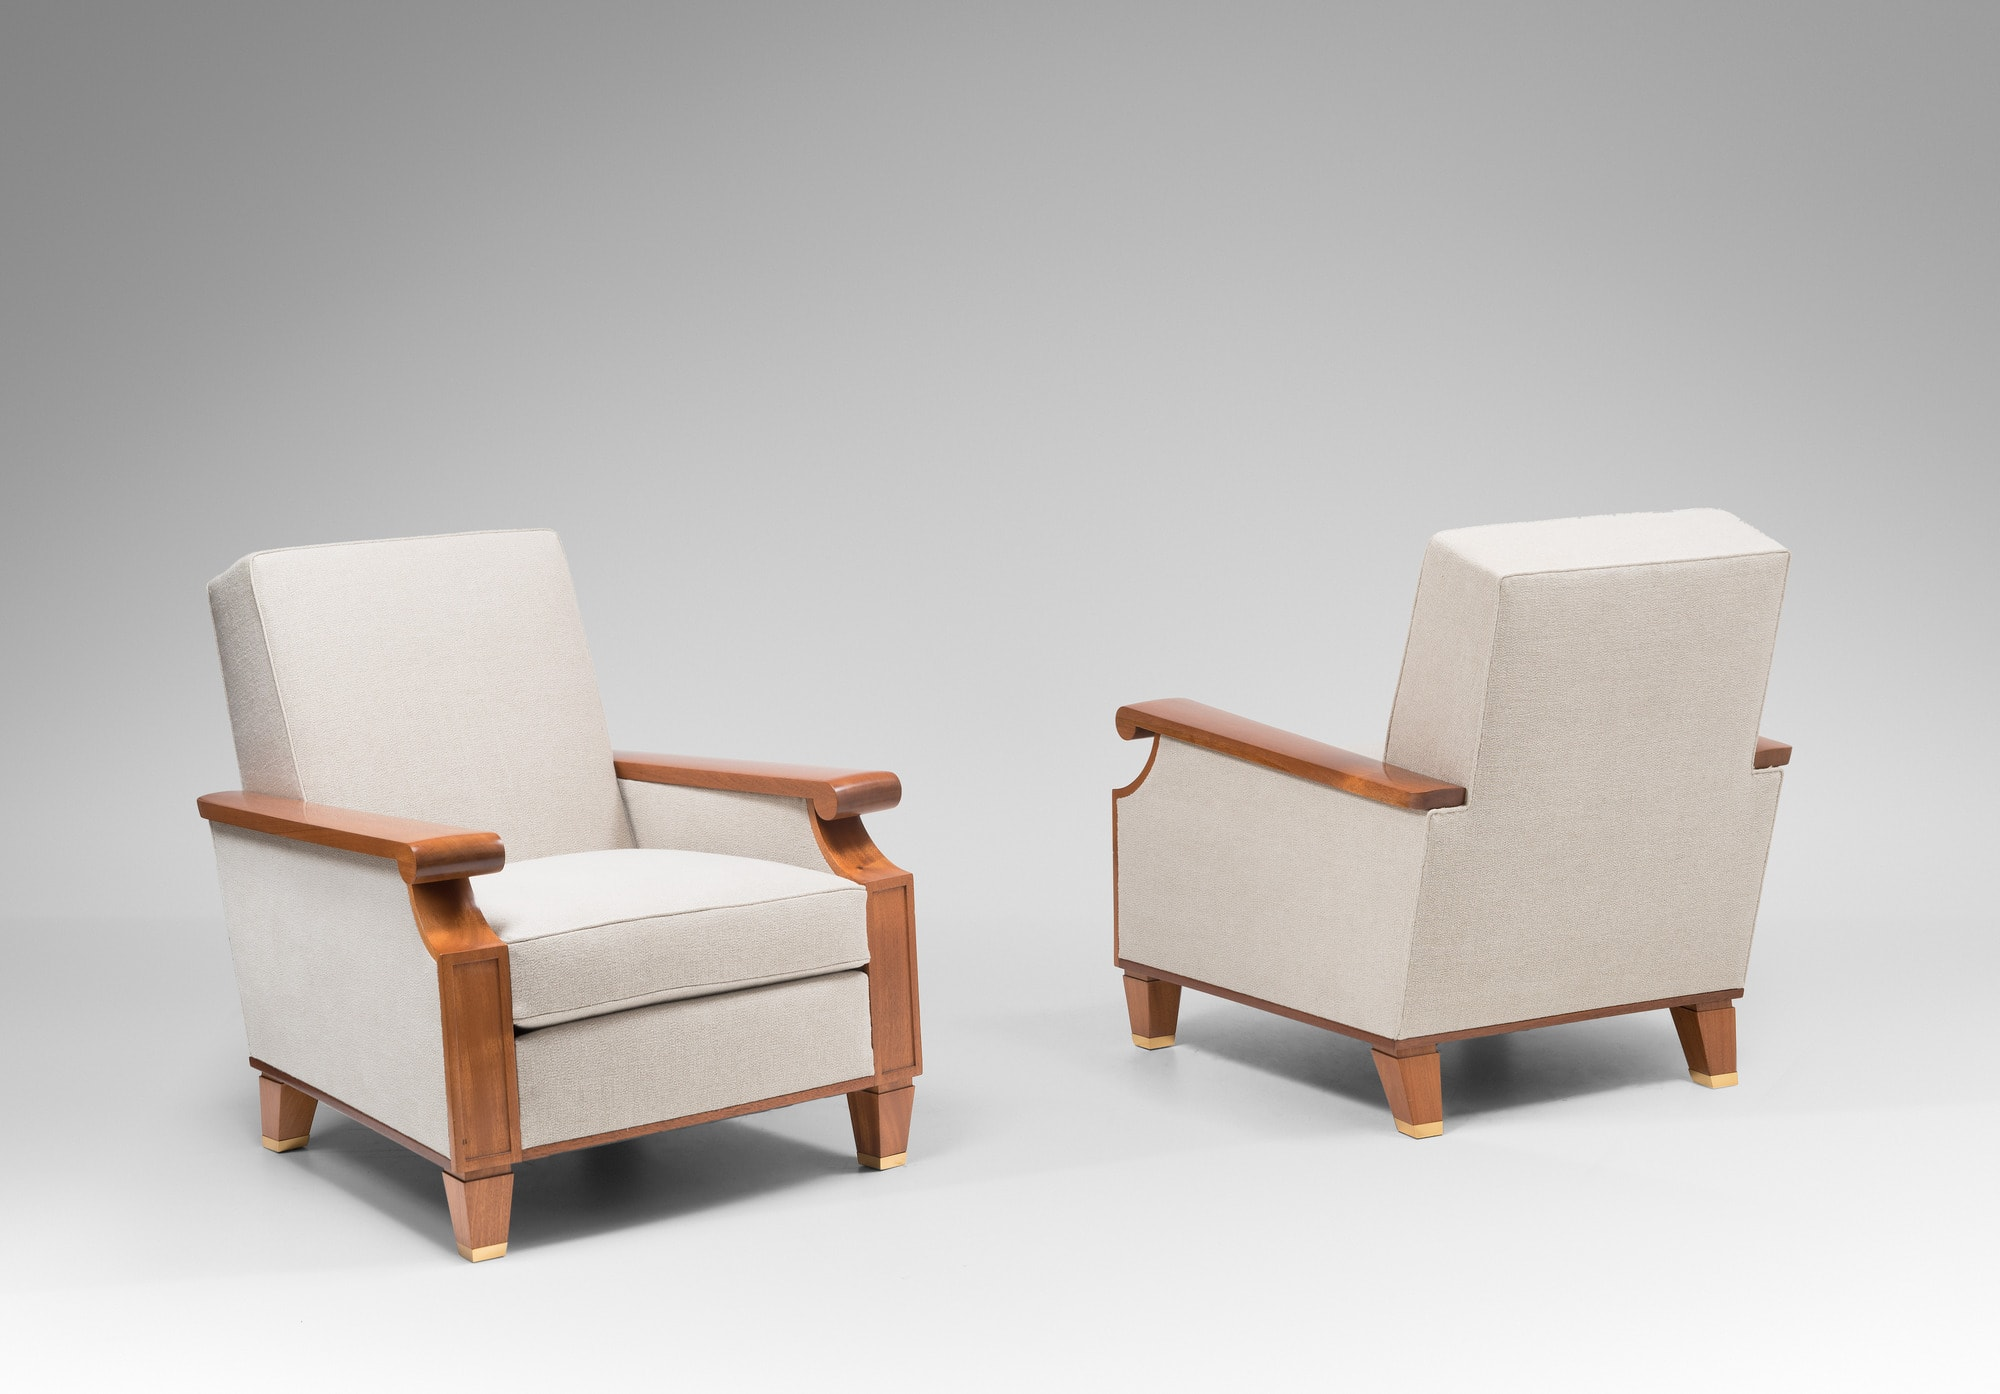 Important et rare pair of armchairs for the Palais des Consuls in Rouen, vue 03